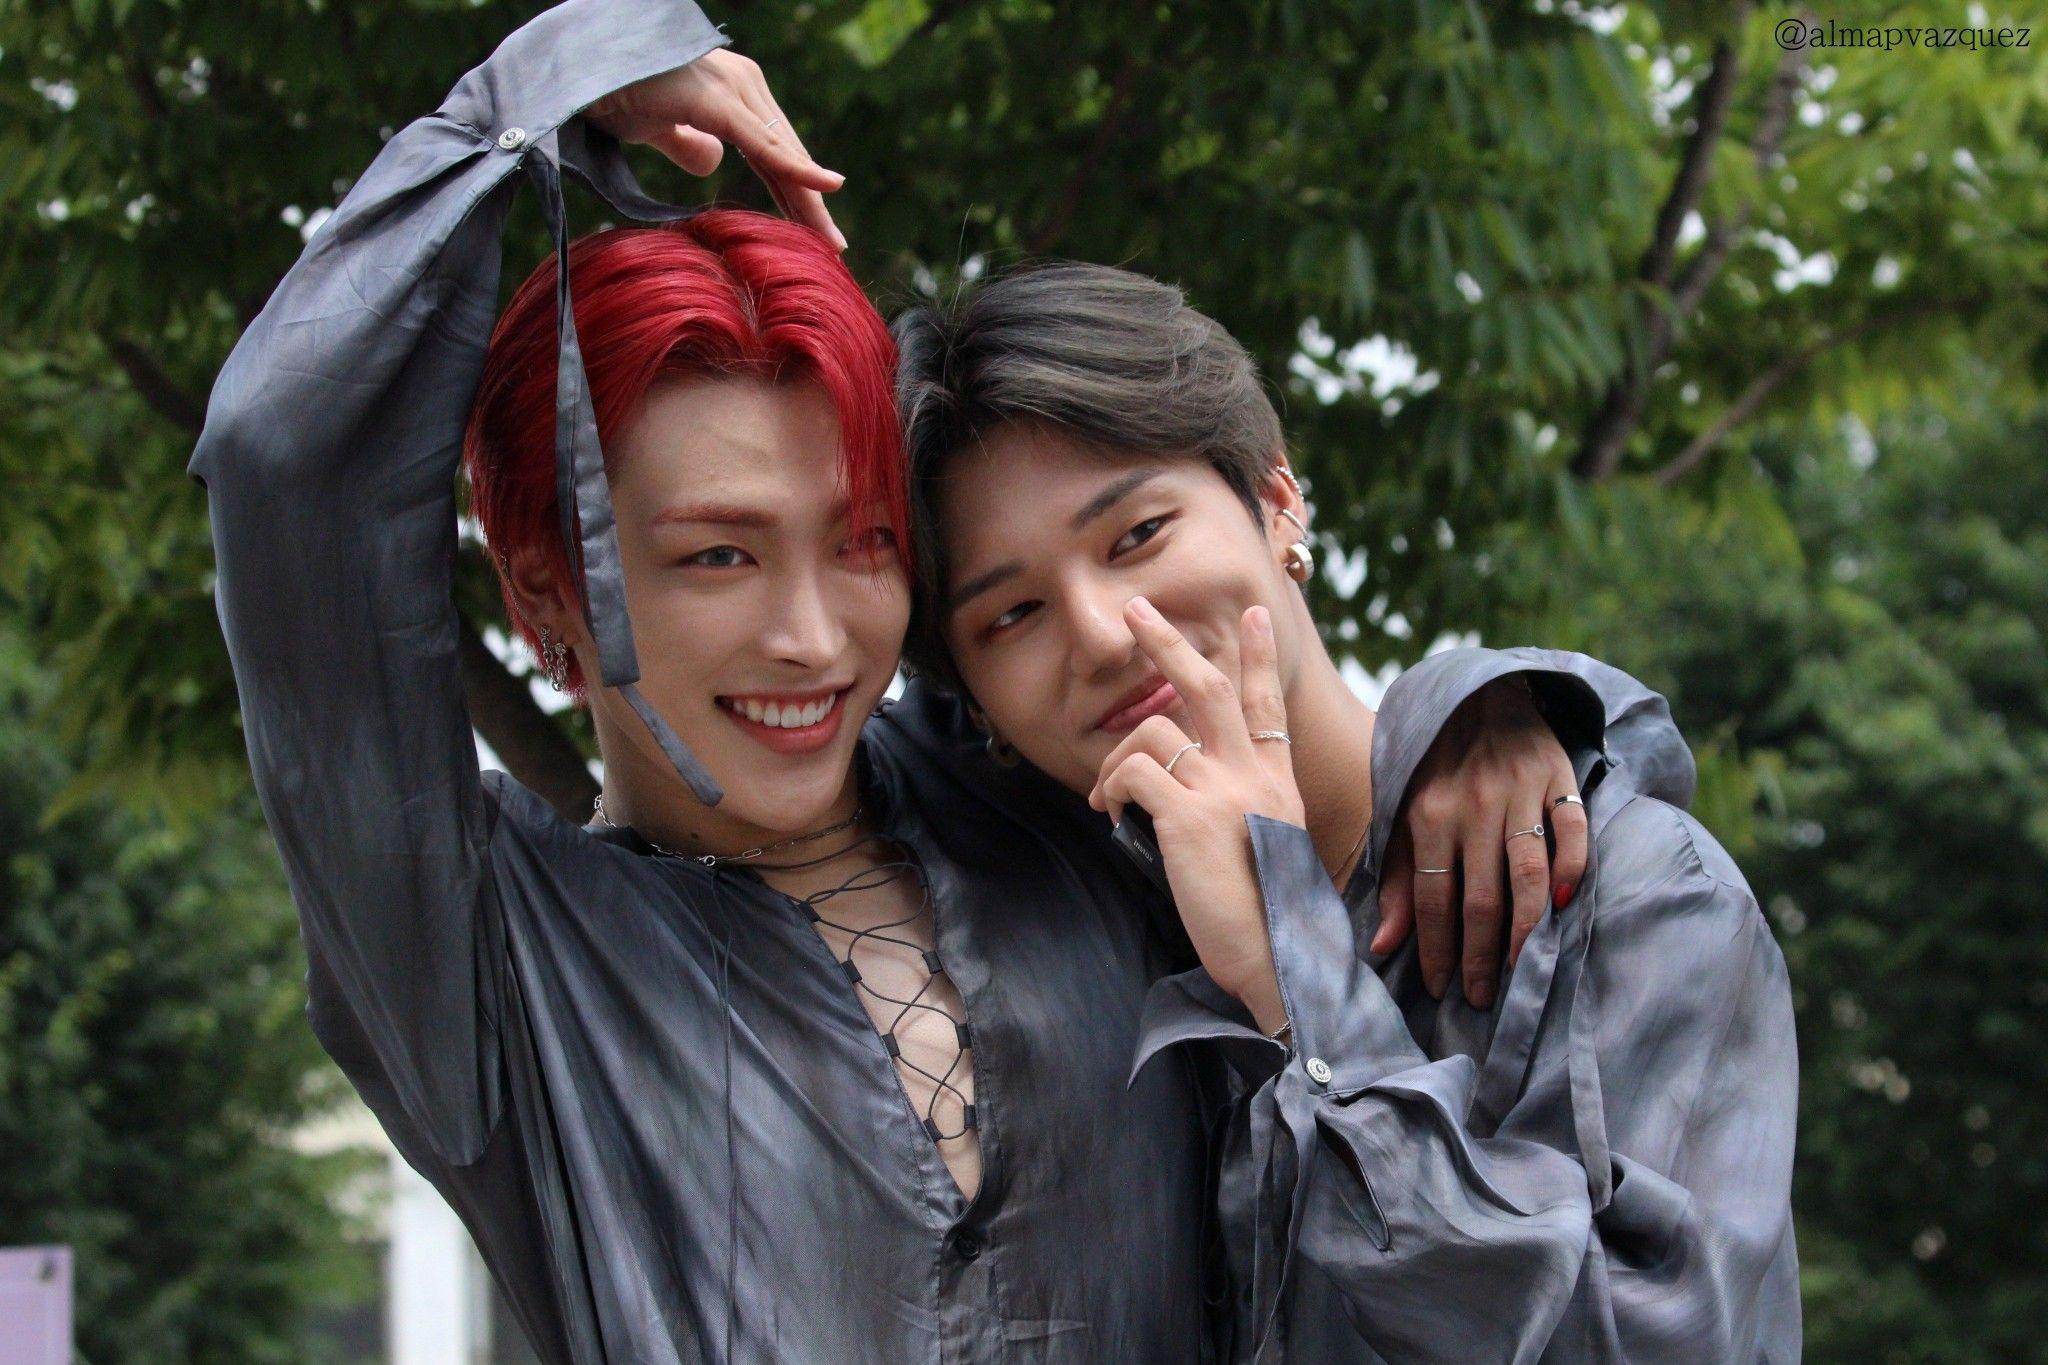 Hongjoong & Wooyoung - ATEEZ almapvazquez